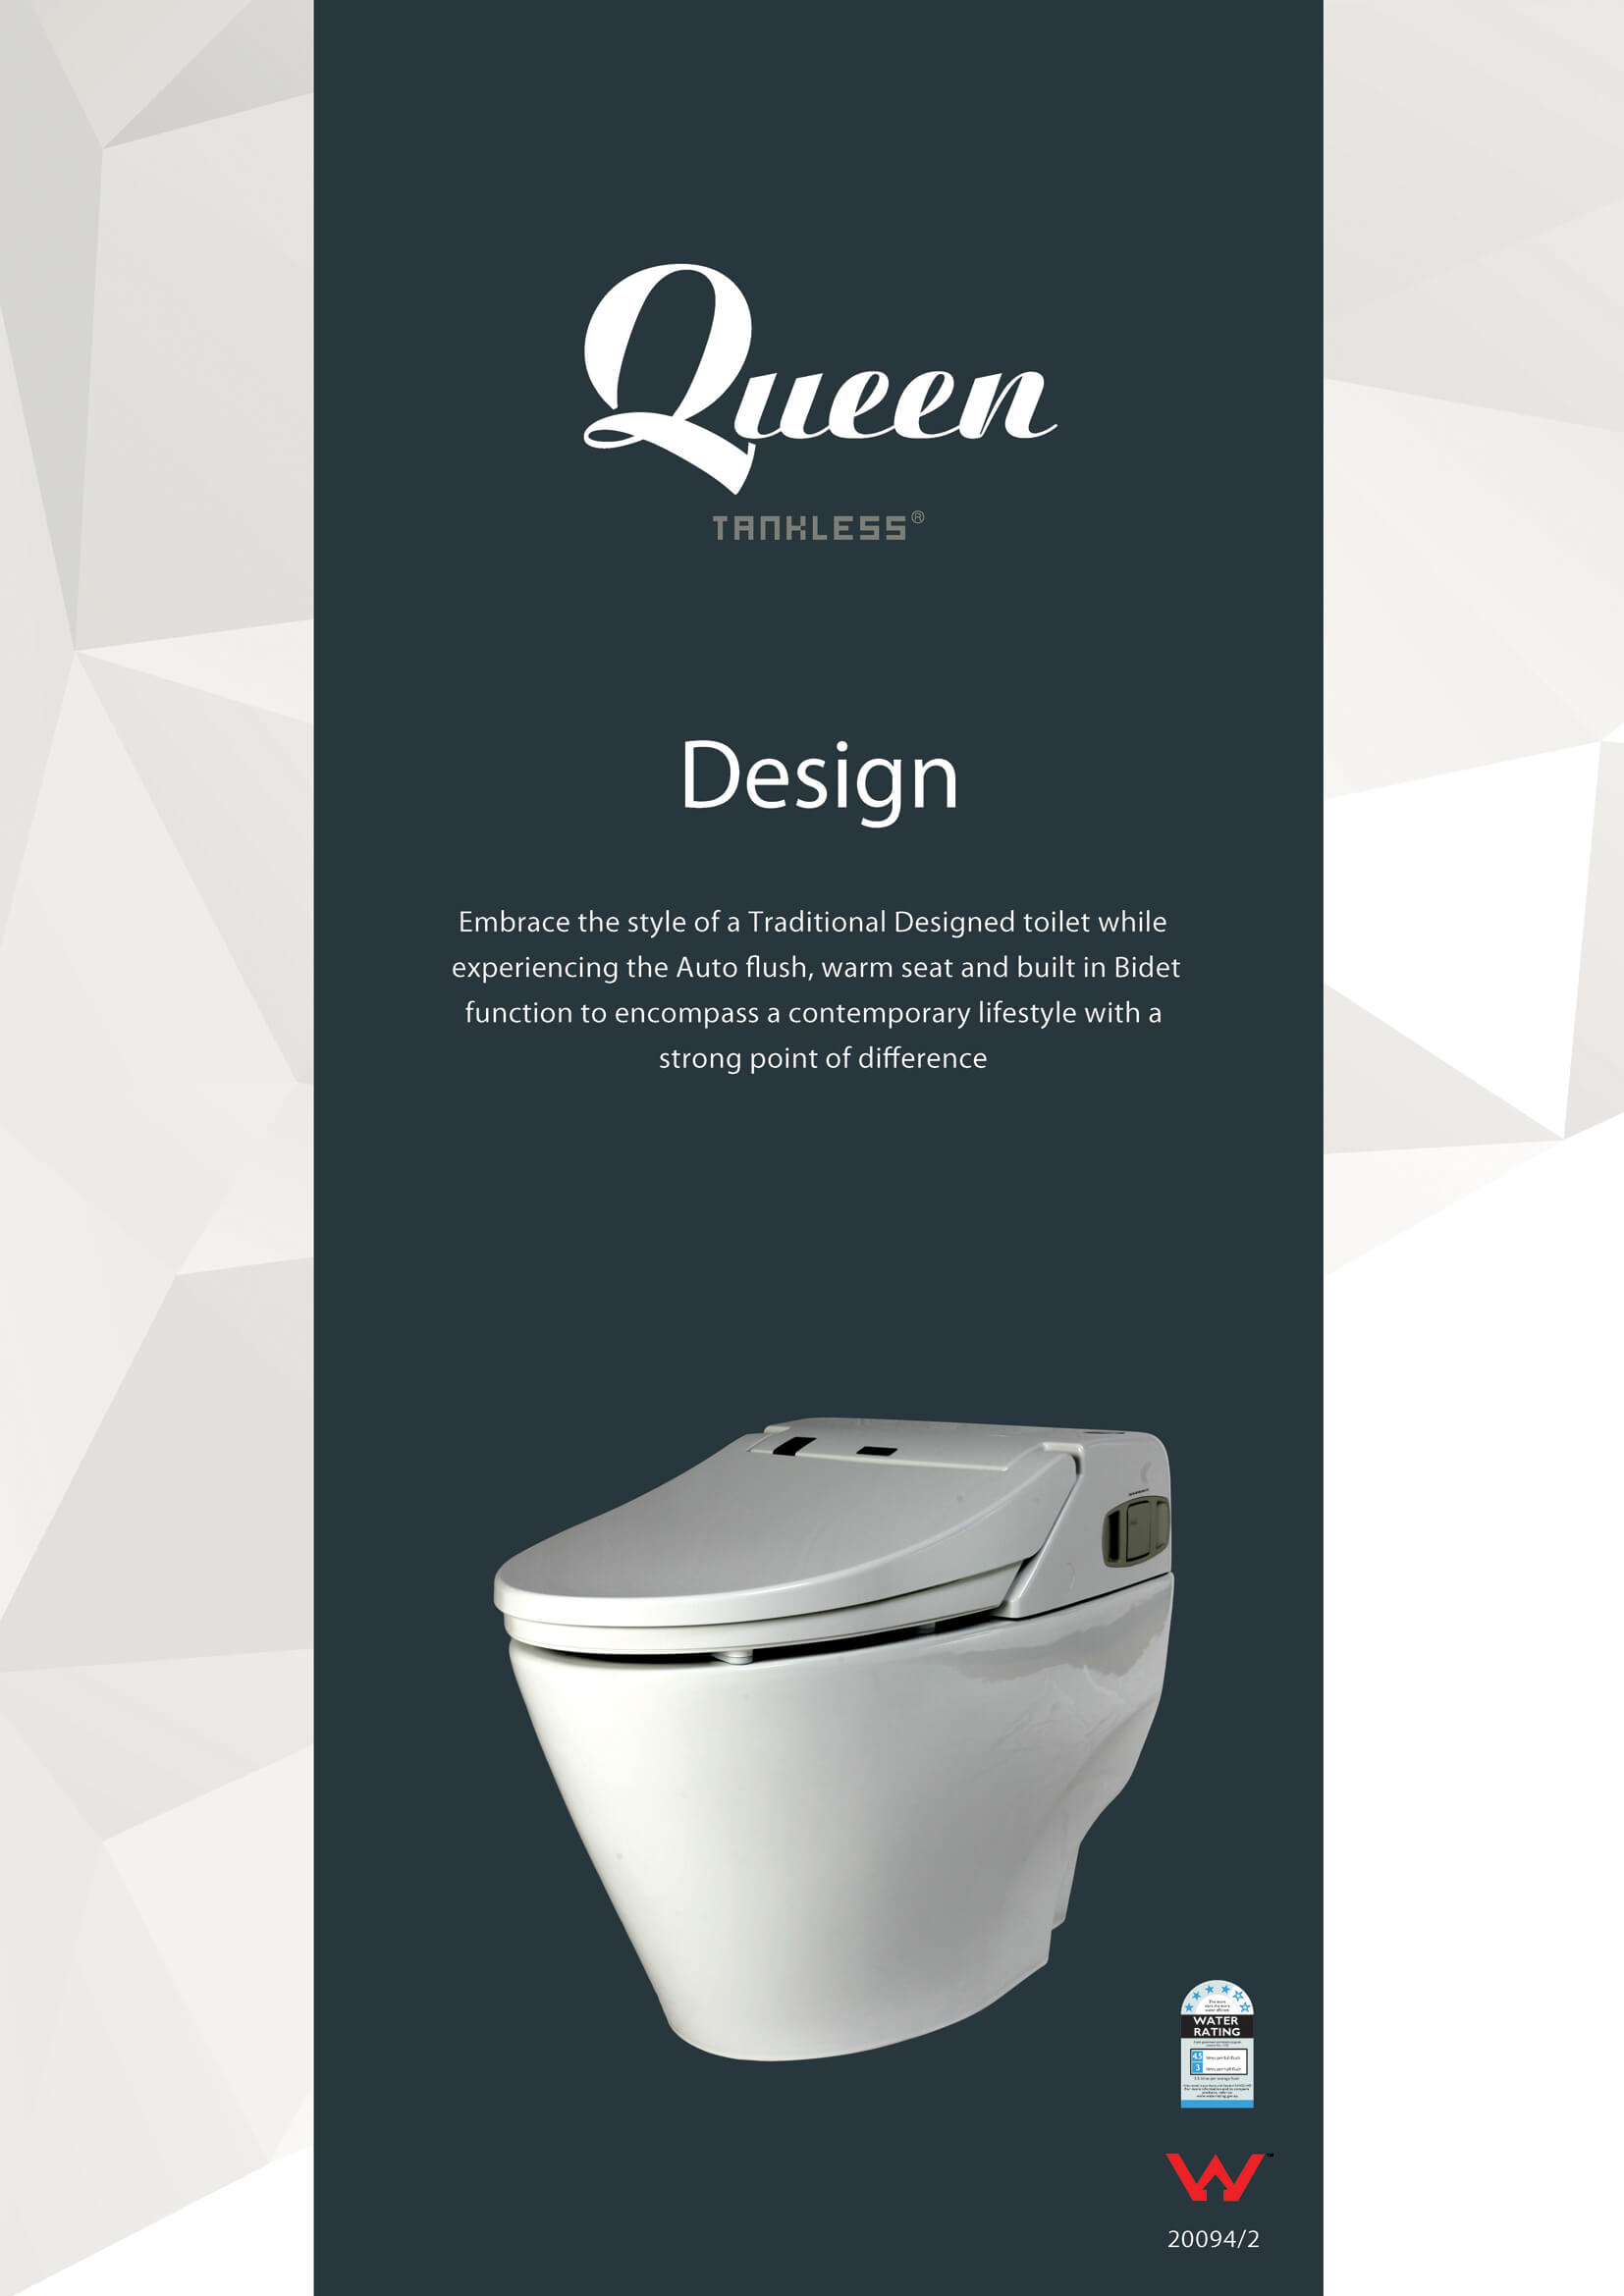 queen-brochure-throne-2016-page-2.jpg